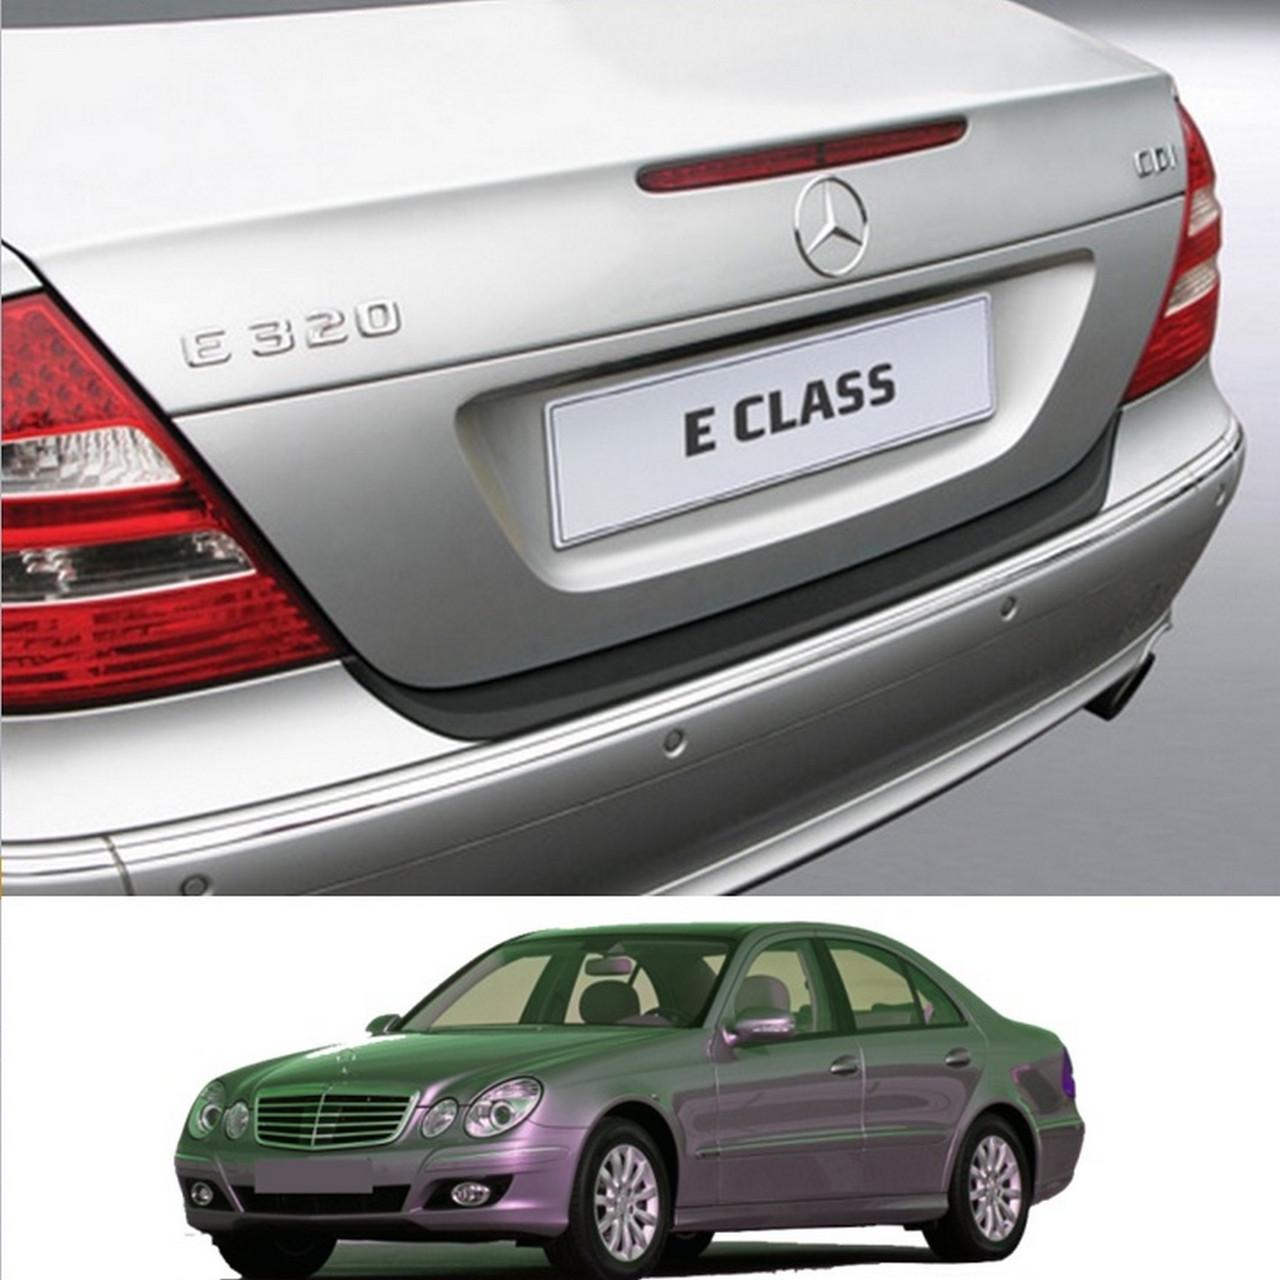 Mercedes-Benz E-Class W211 2002-2009 пластиковая накладка заднего бампера